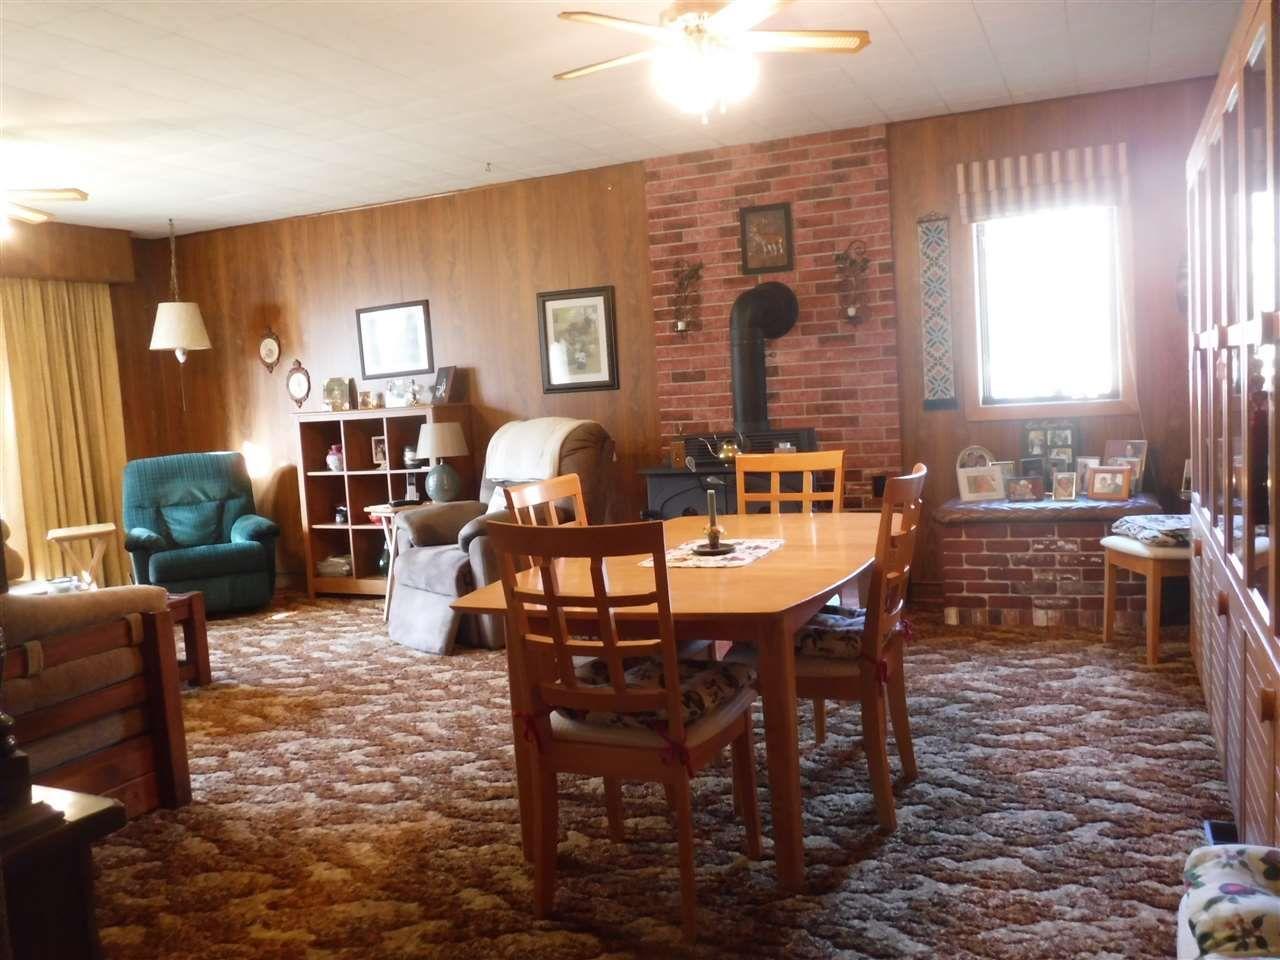 Photo 10: Photos: 1599 MACKENZIE Highway in Bella Coola: Bella Coola/Hagensborg House for sale (Williams Lake (Zone 27))  : MLS®# R2449026